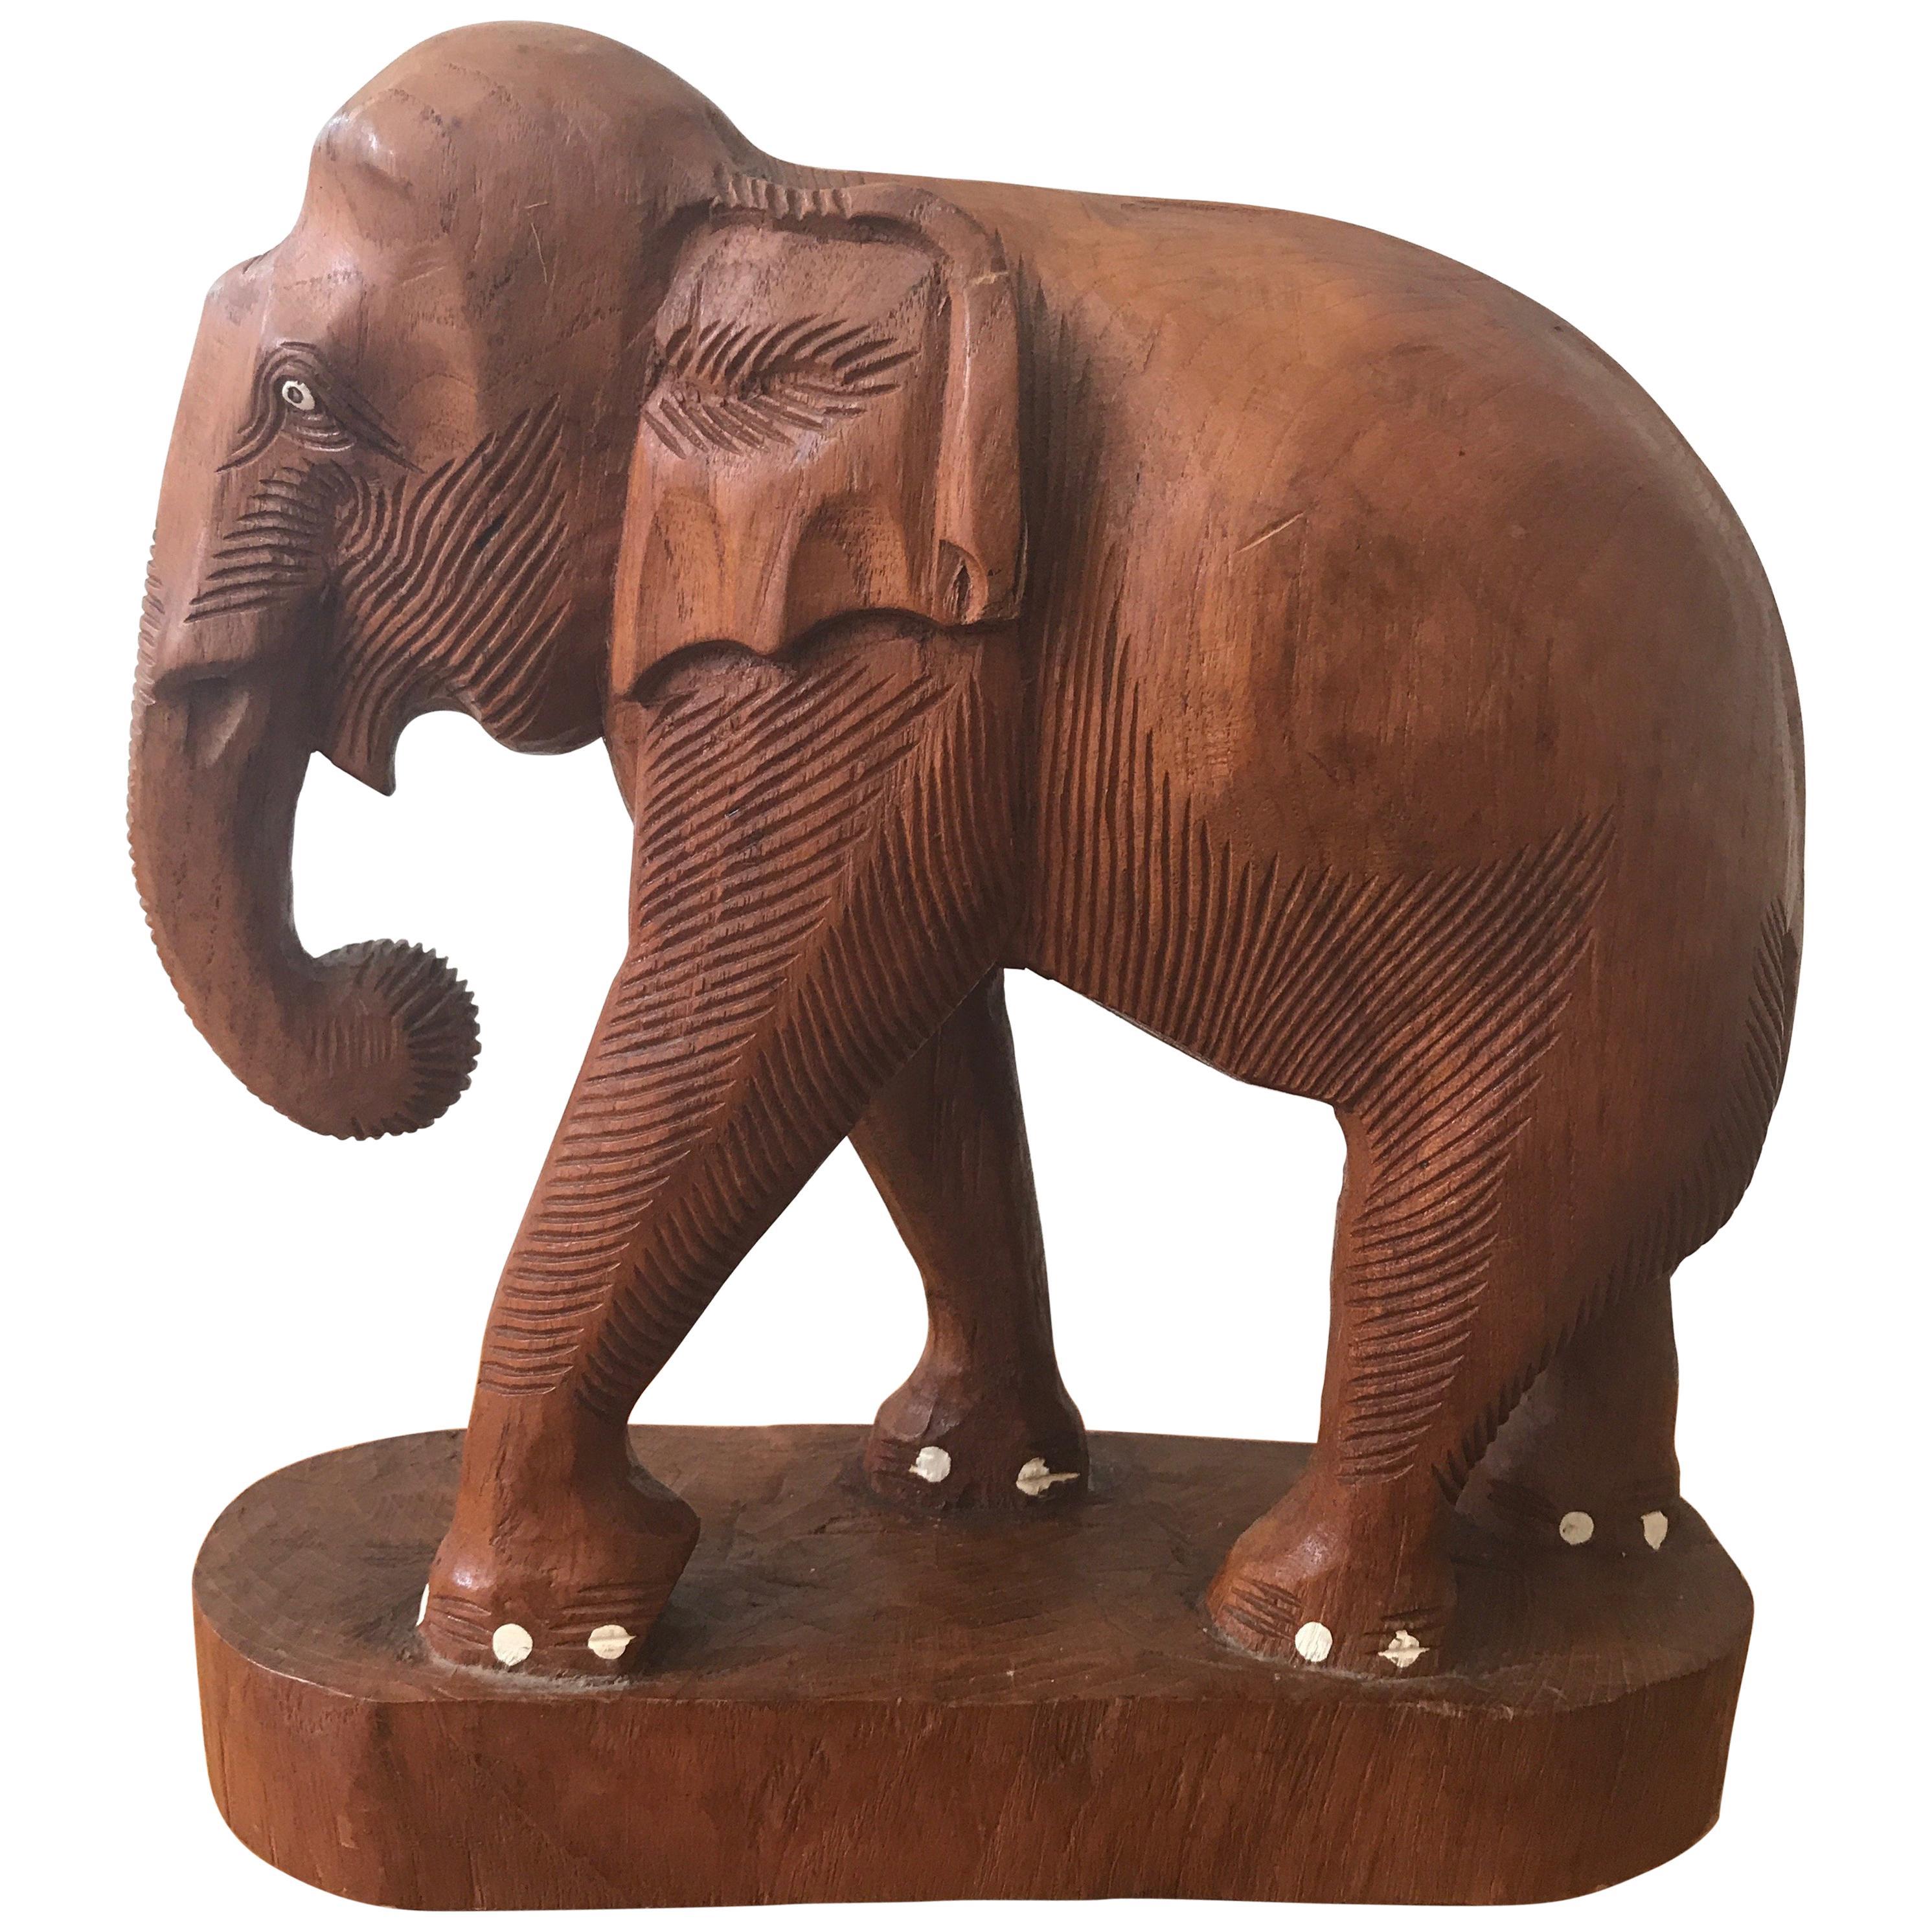 Large Carved Wood Elephant Sculpture